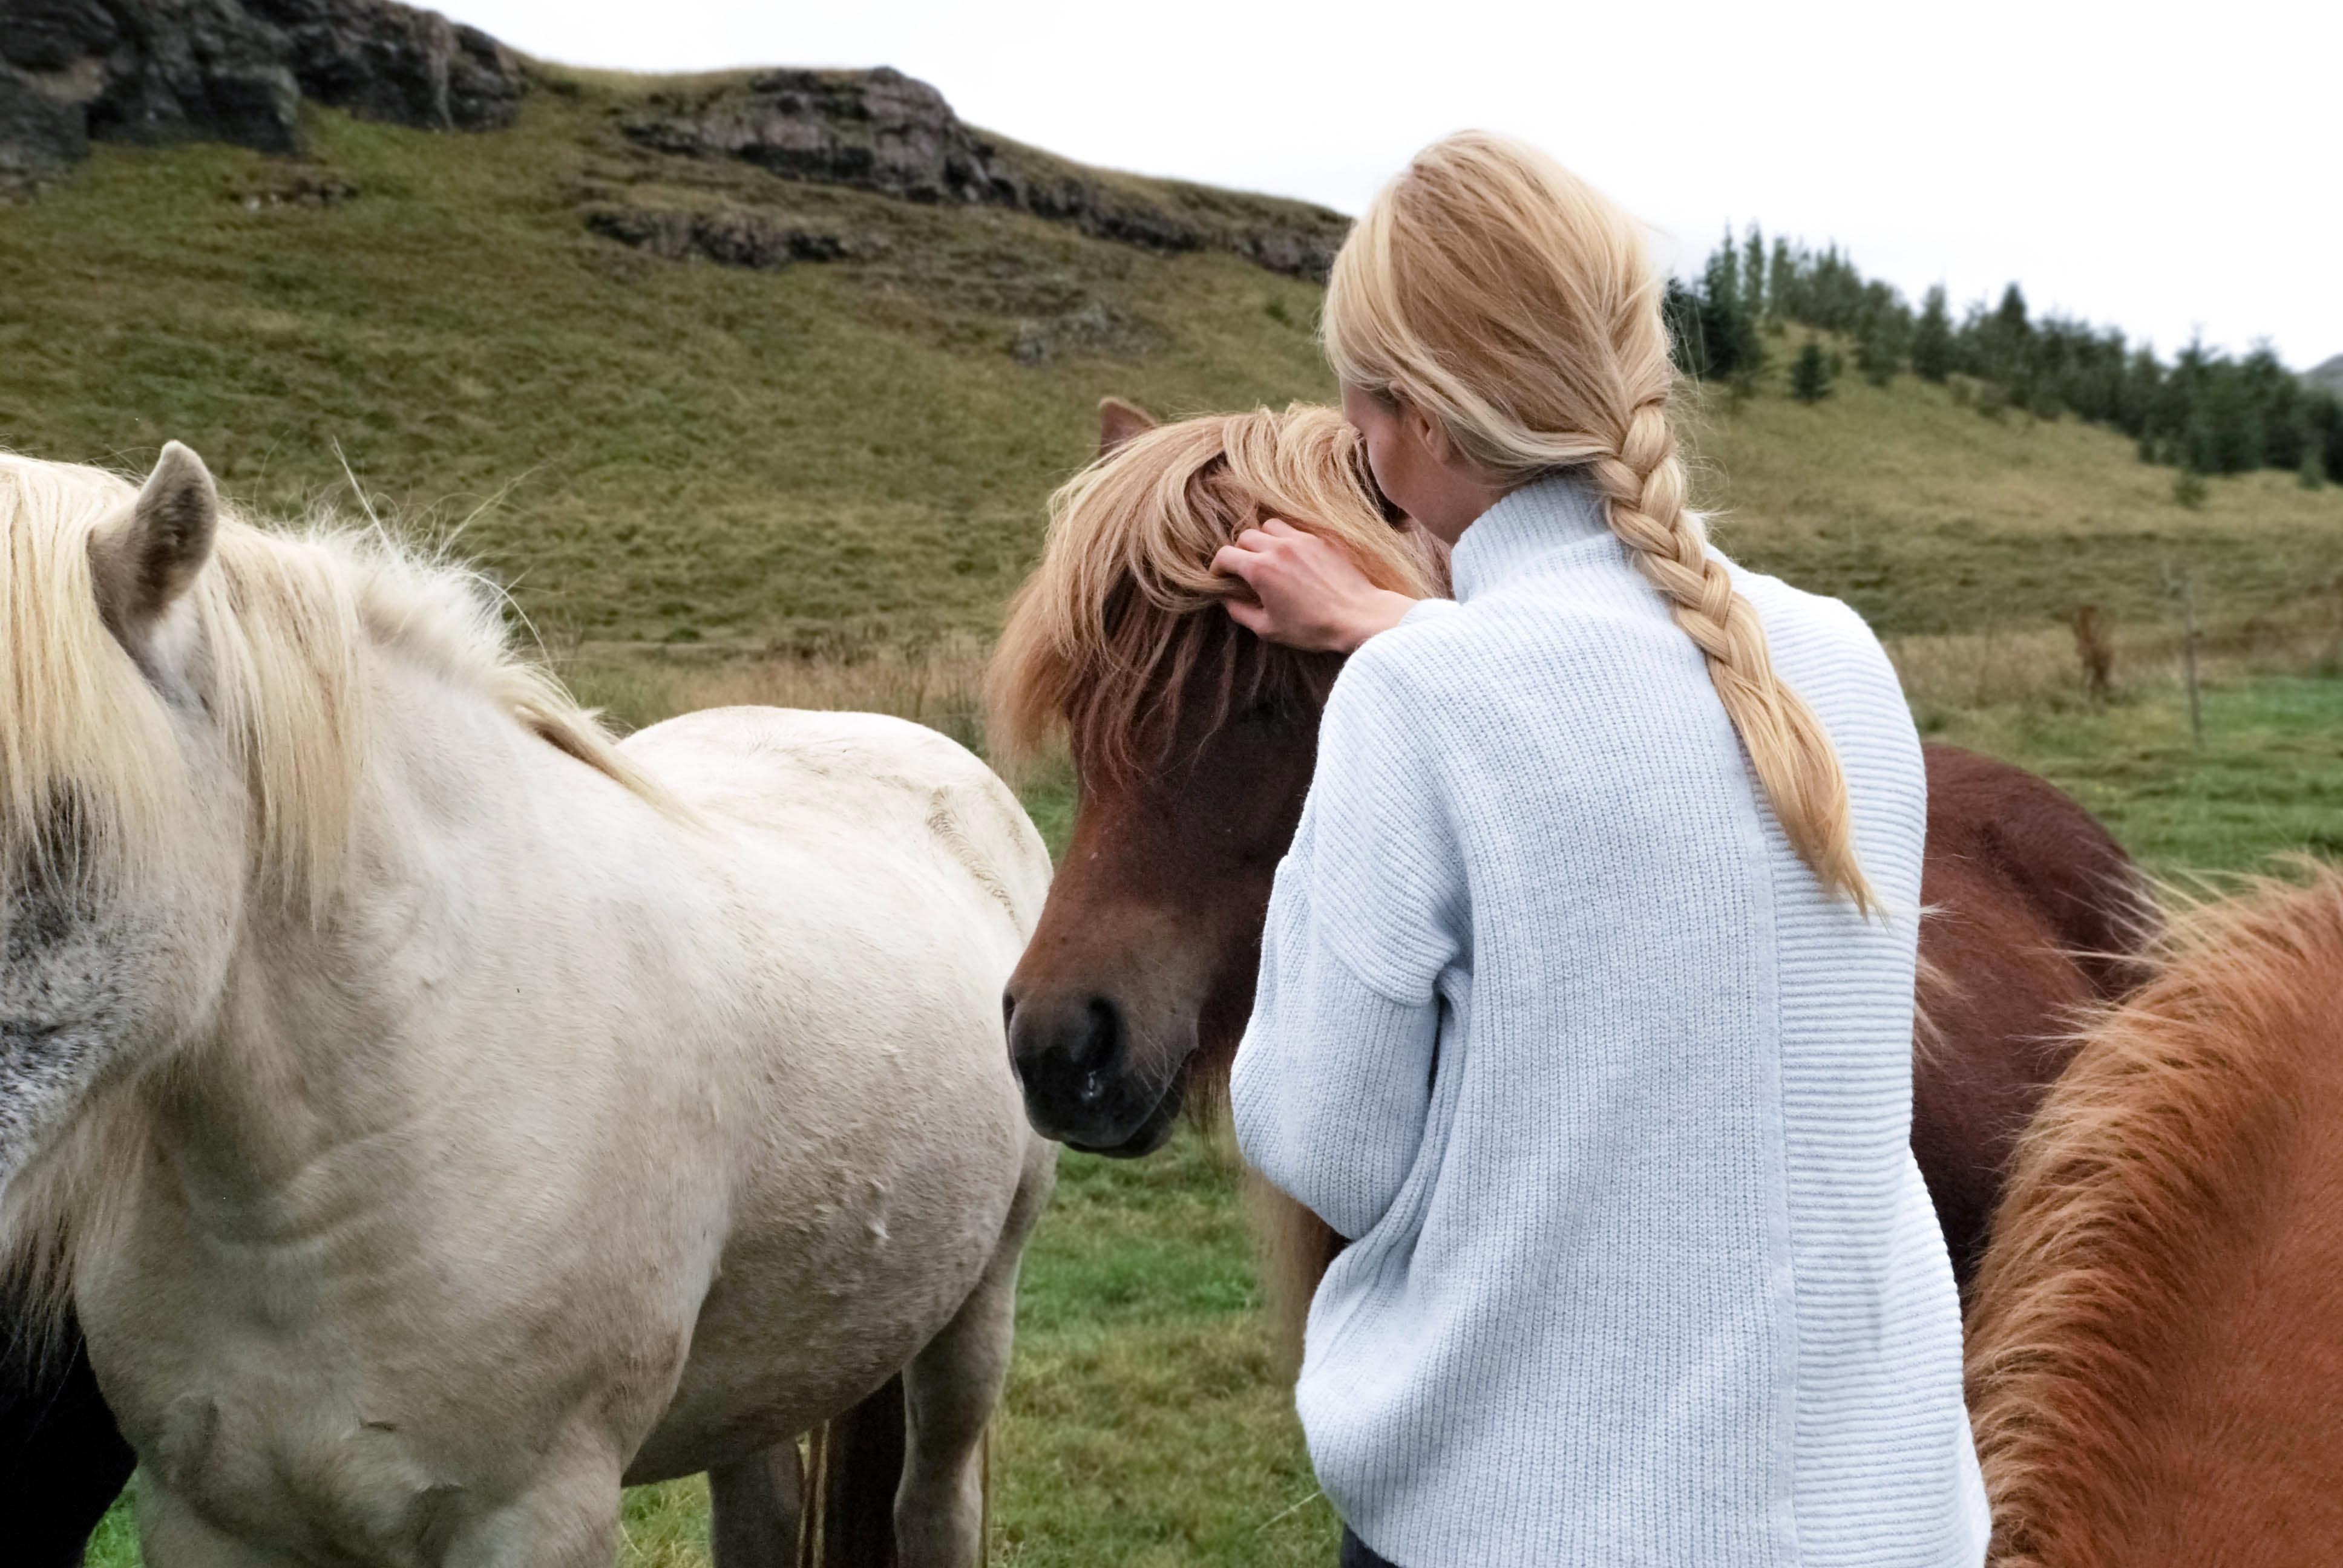 Woman Touching Horse